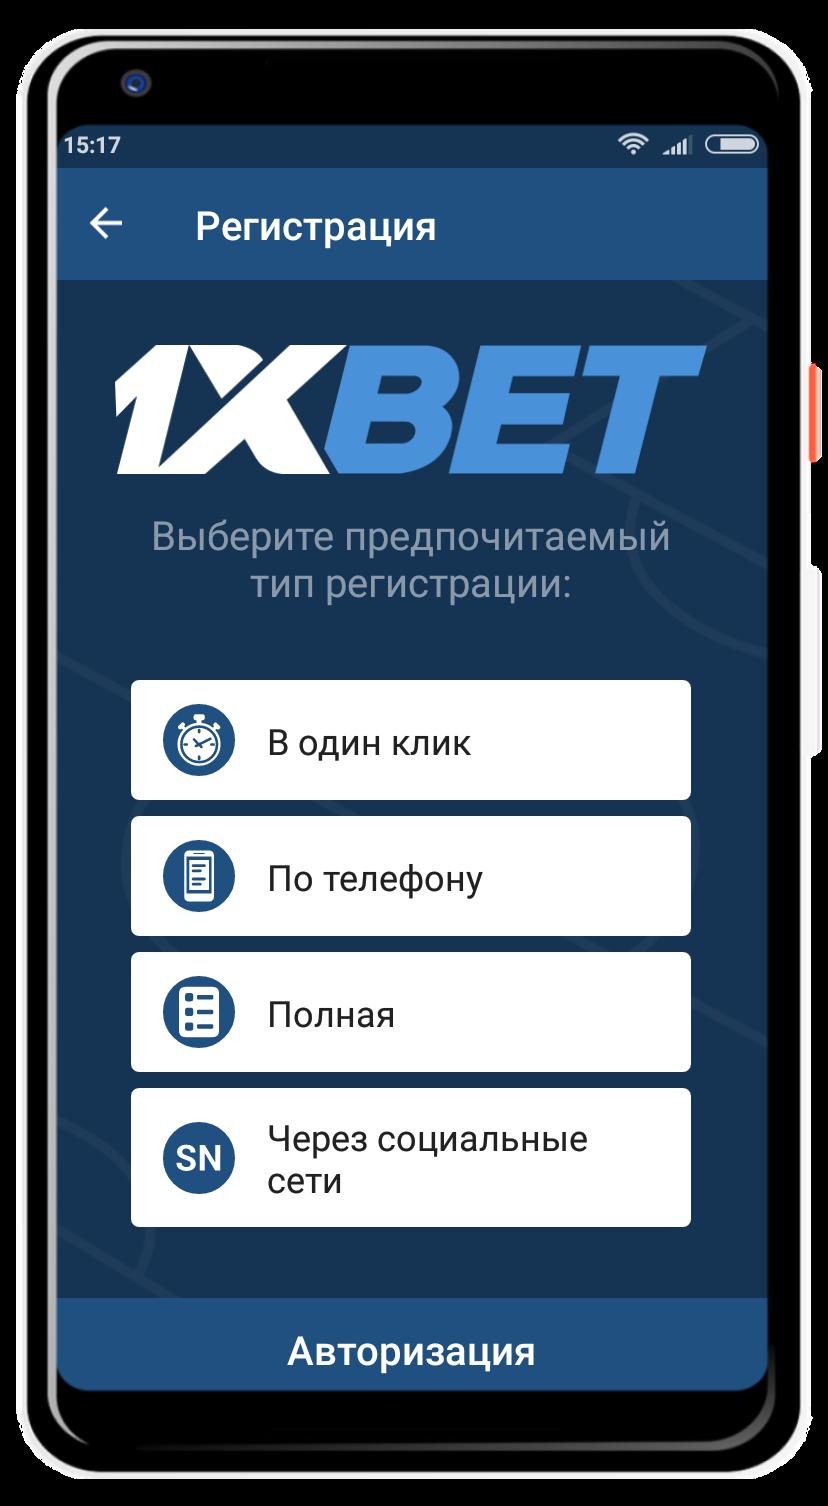 Регистрация в андроид 1хбет